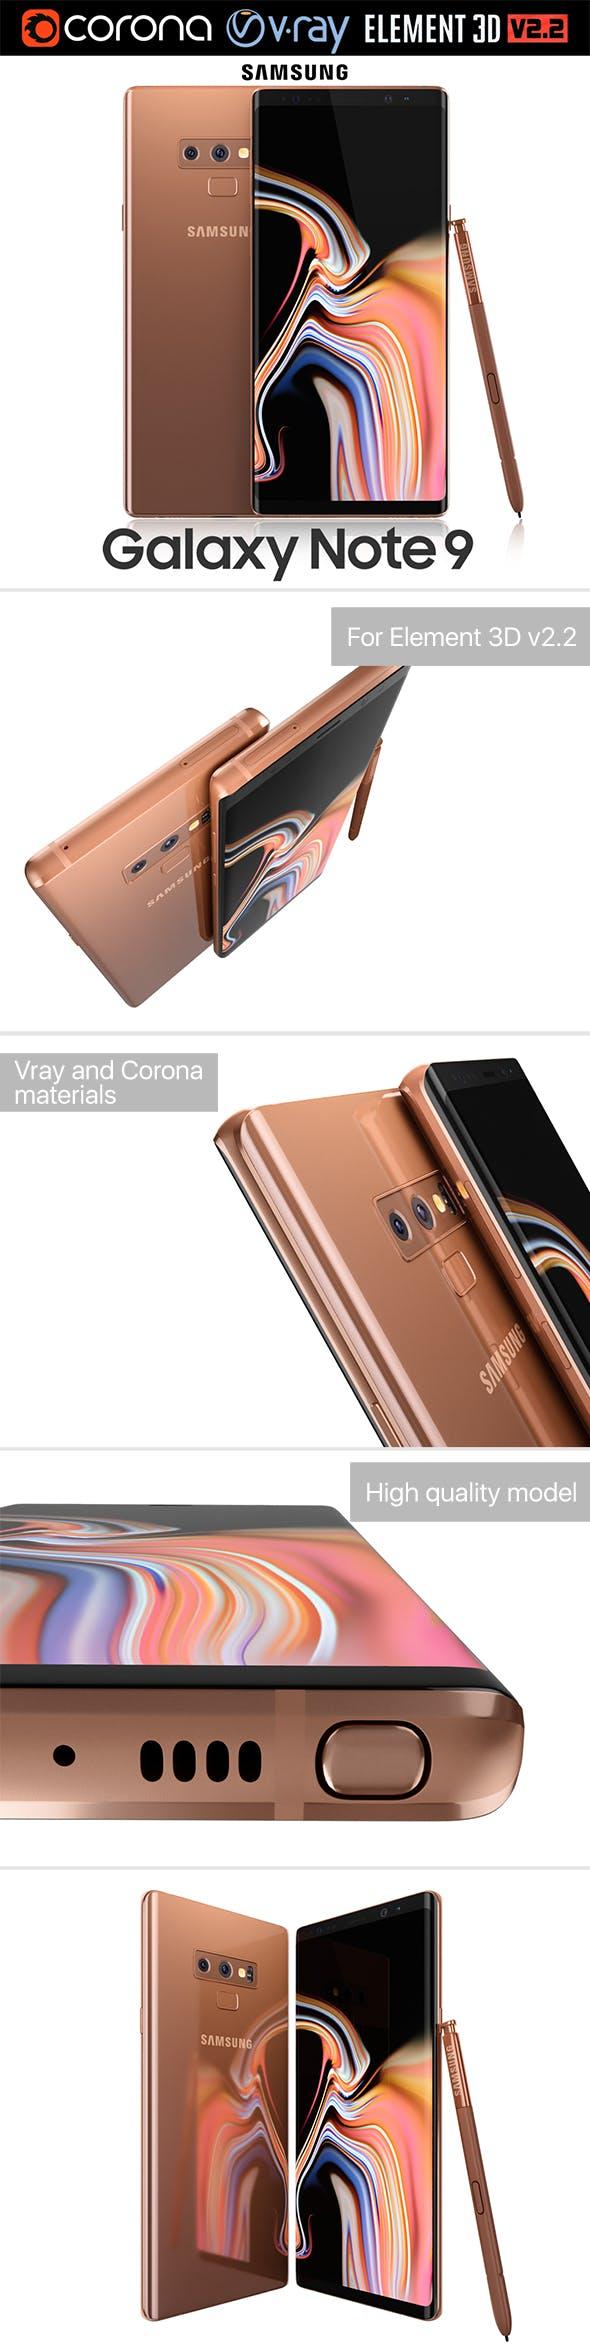 Samsung GALAXY Note 9 Metallic Copper - 3DOcean Item for Sale